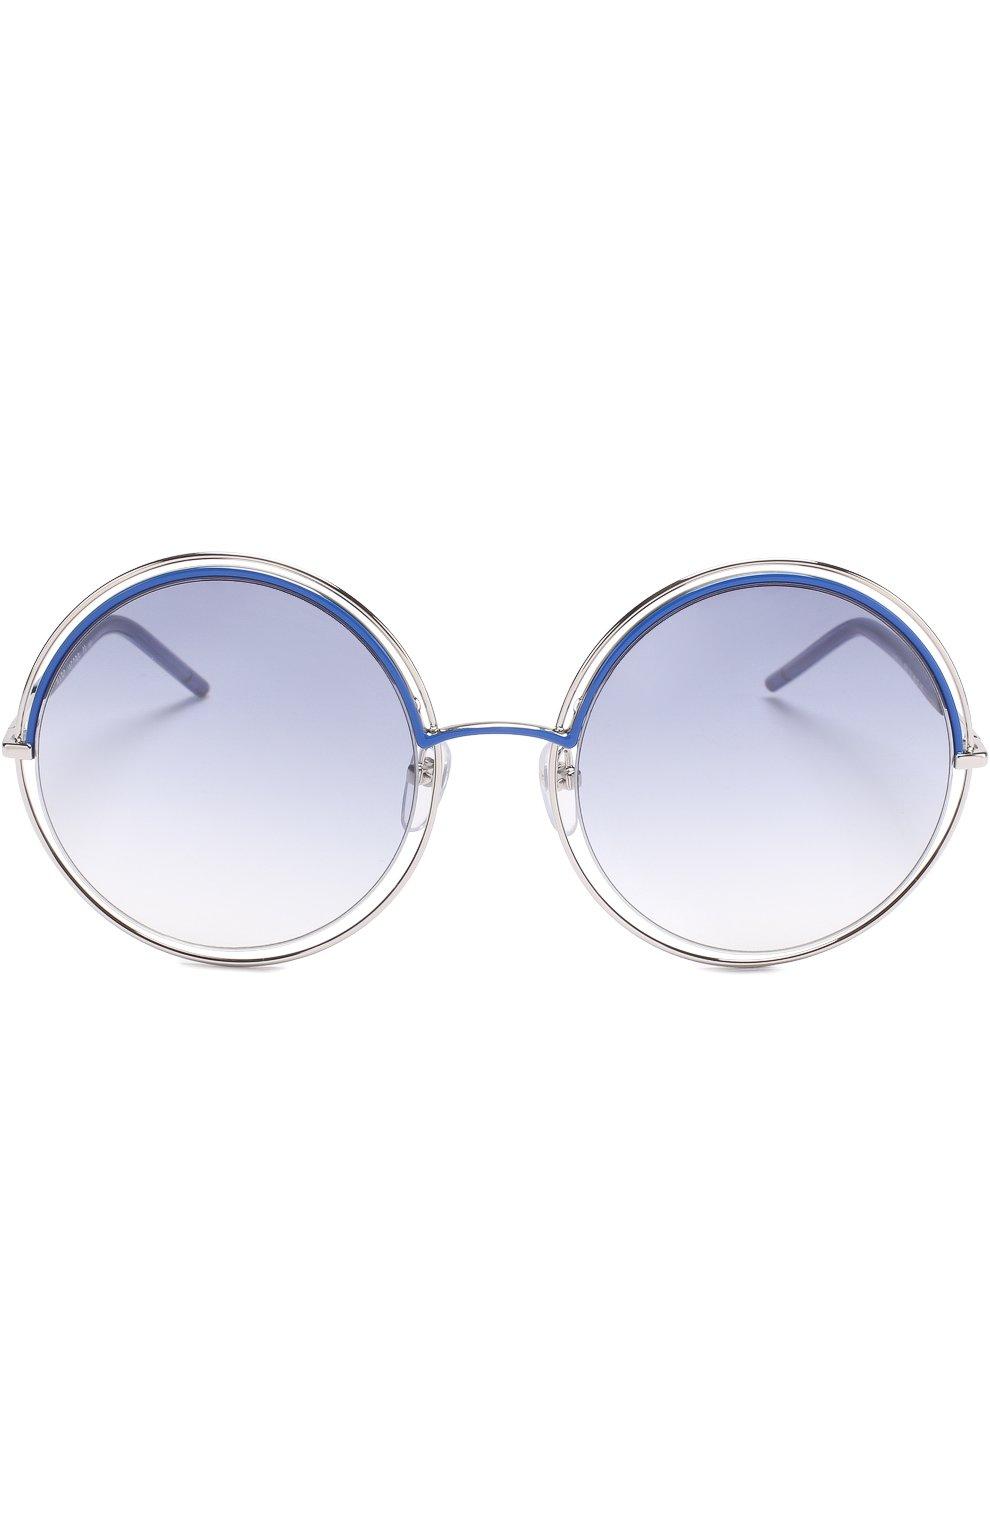 Женские солнцезащитные очки MARC JACOBS (THE) синего цвета, арт. MARC 11 TWU | Фото 3